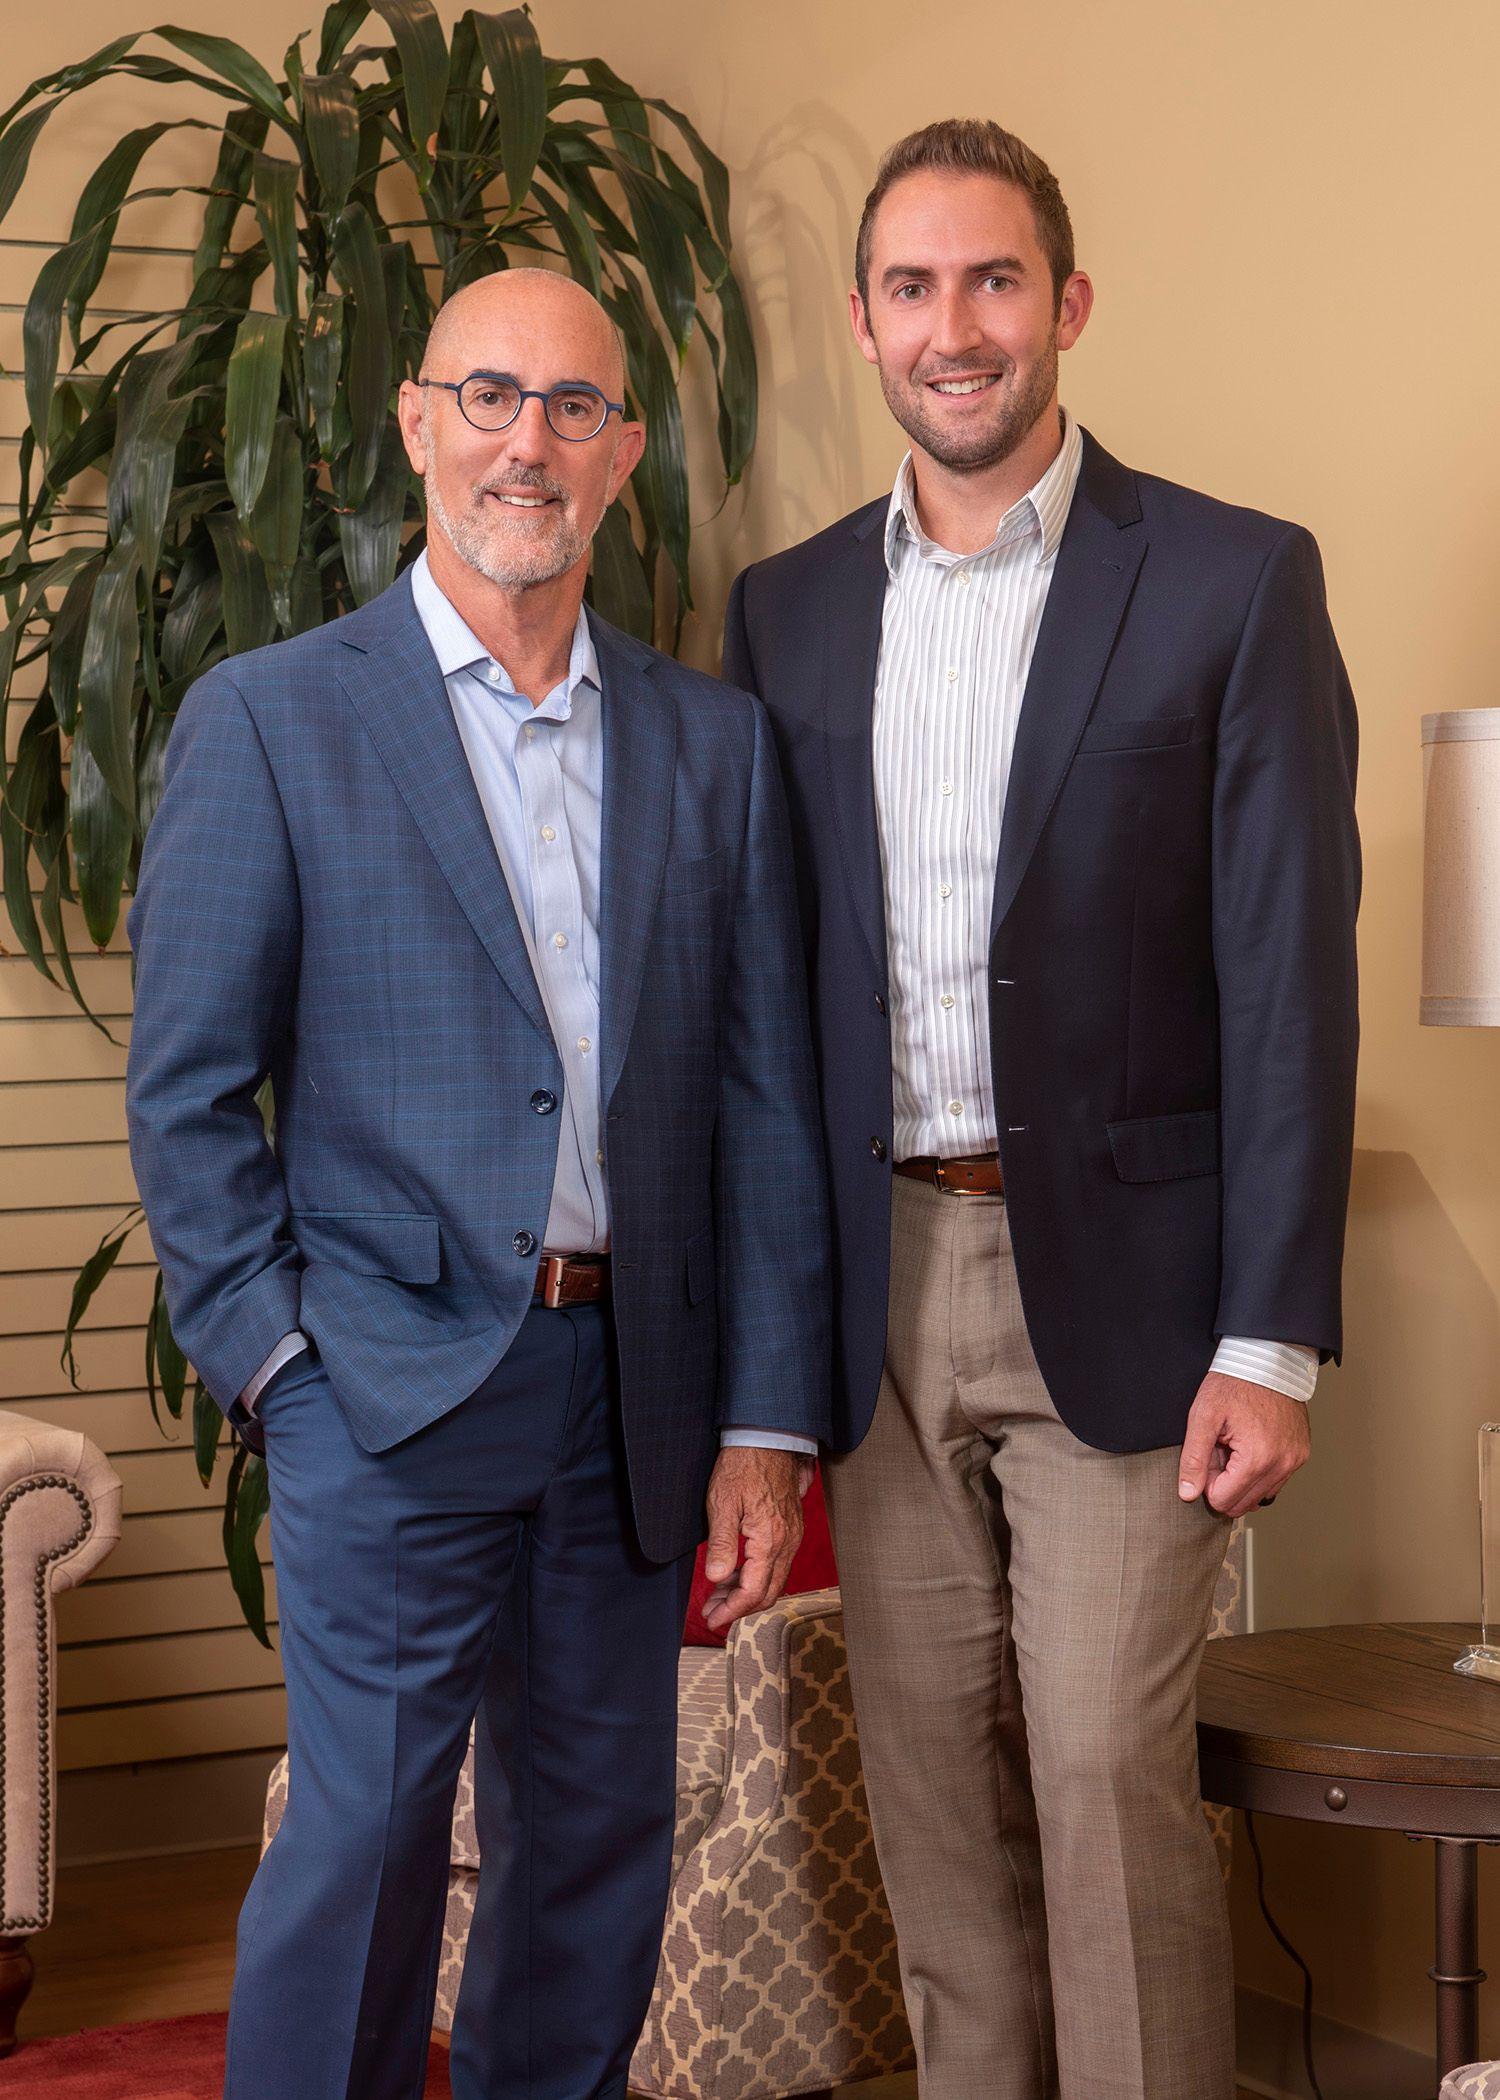 Mark & Kirk Febus Home Care Assistance Dayton Ohio